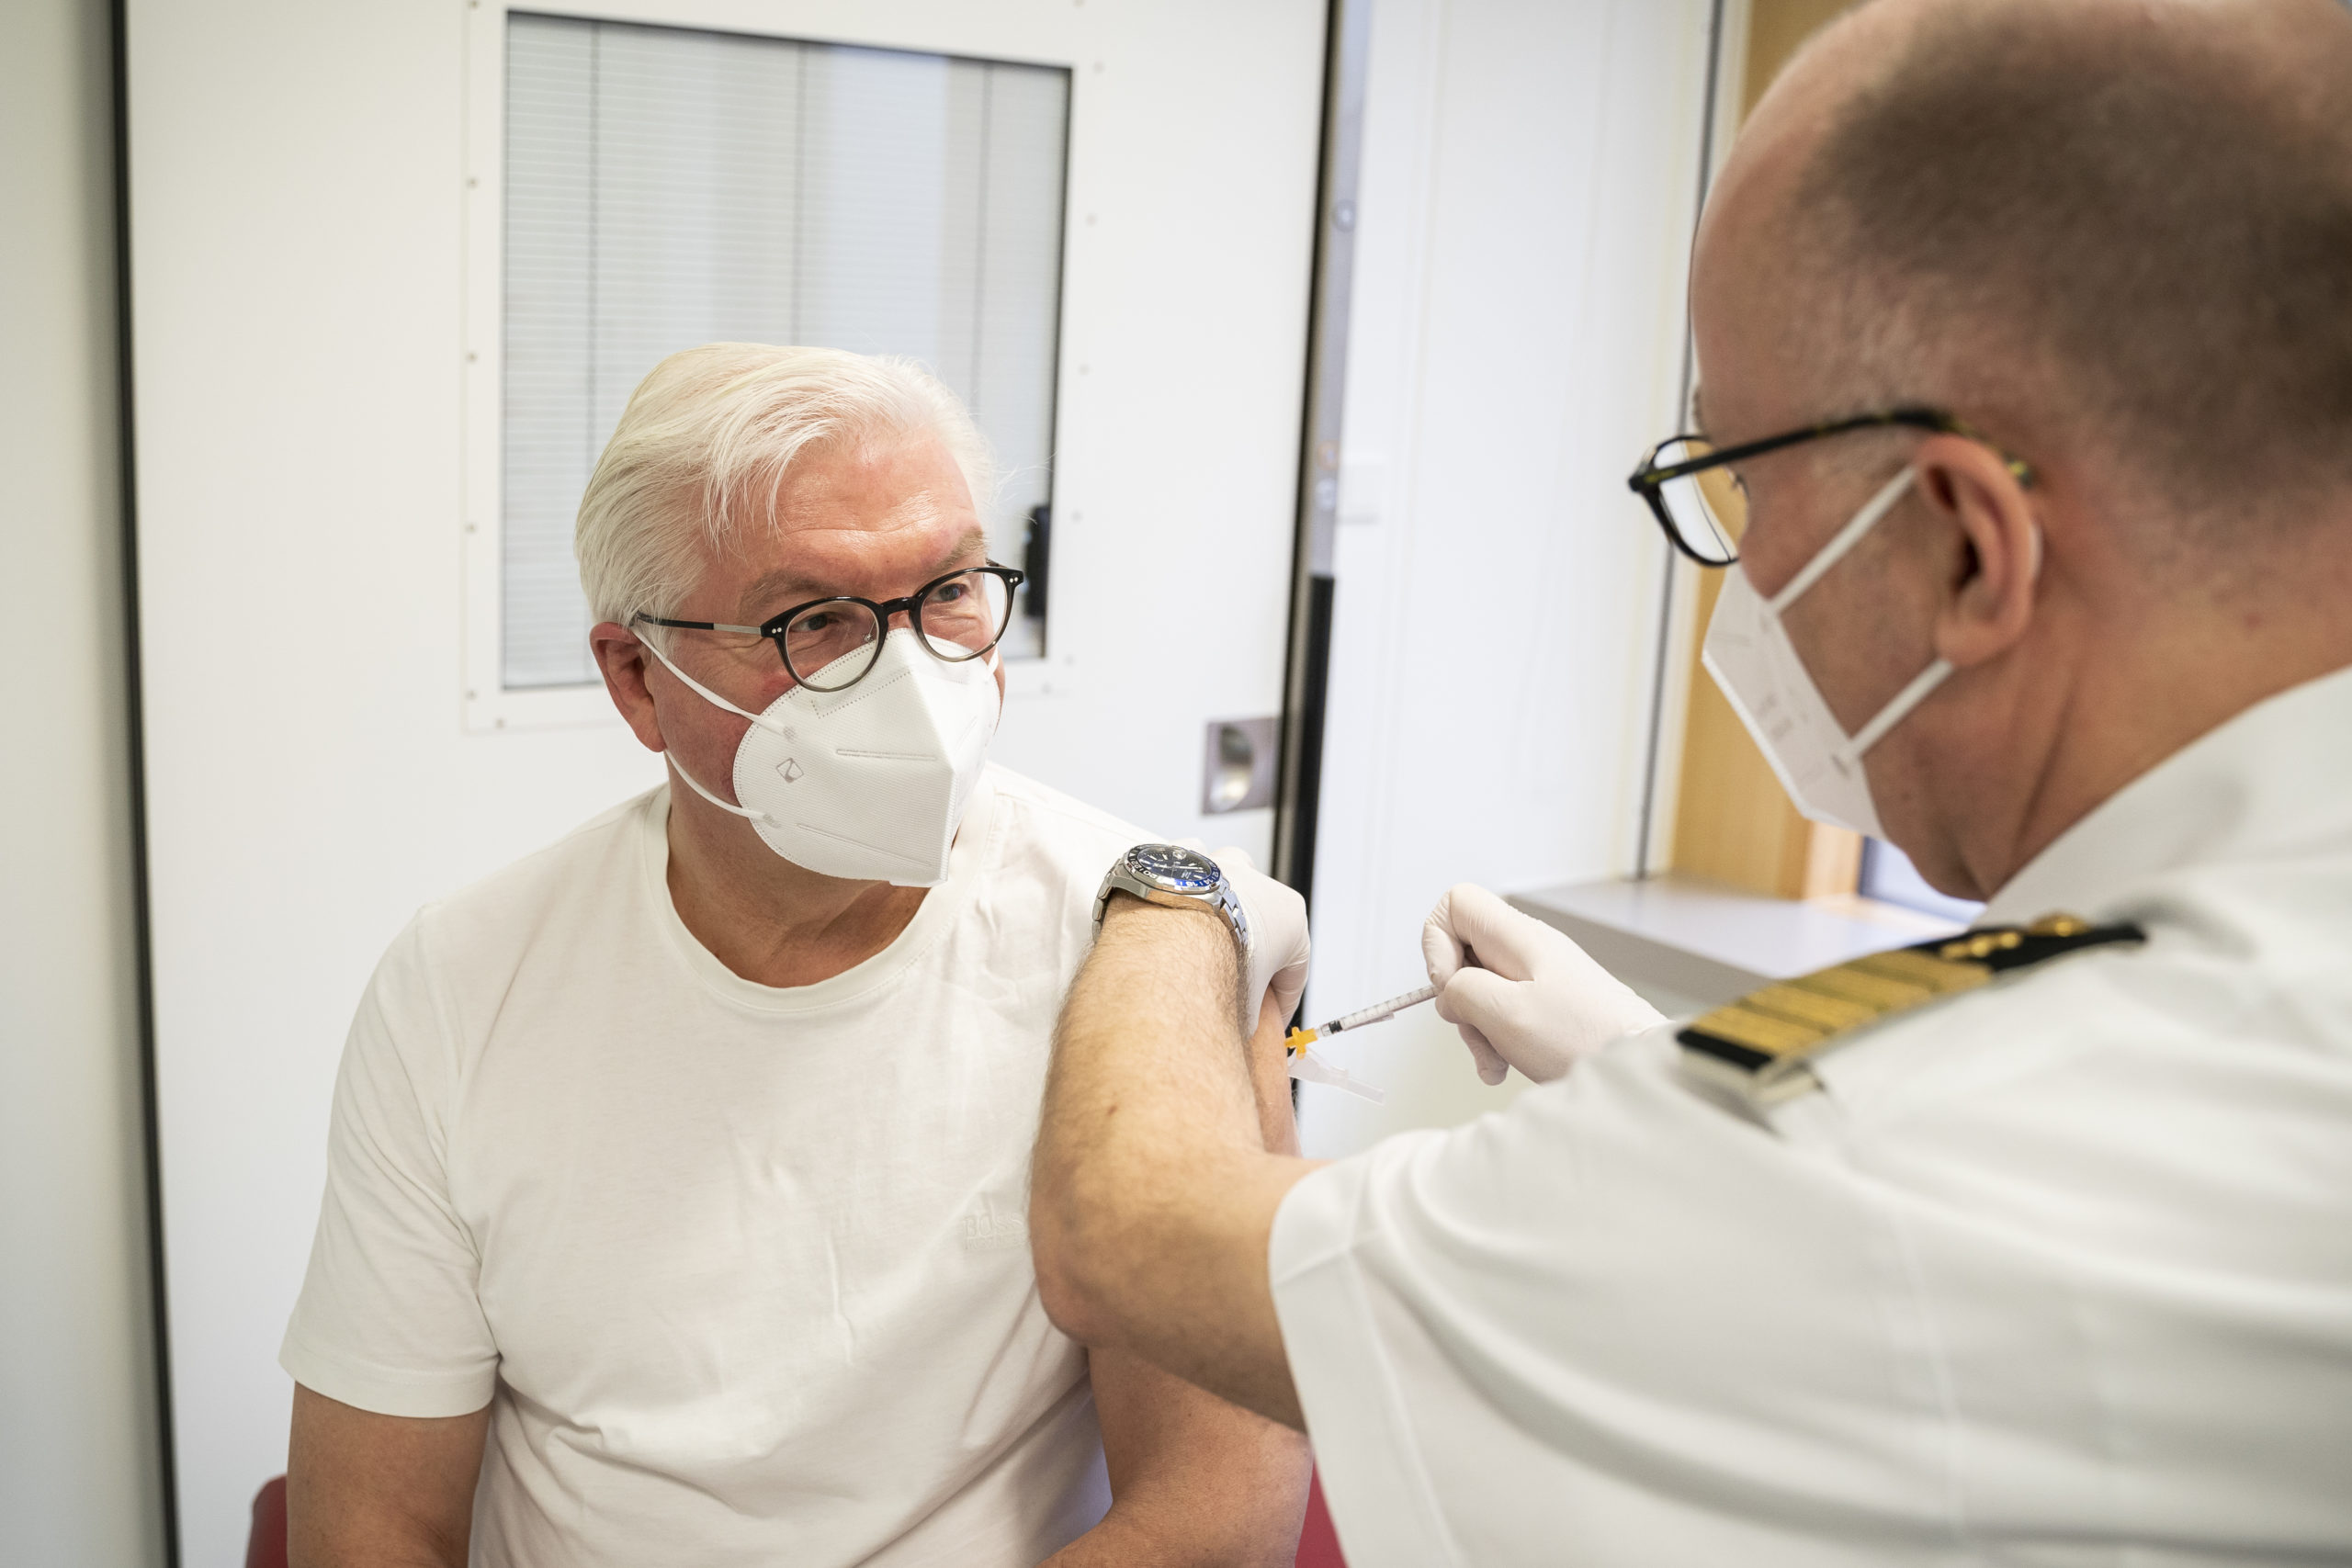 Germany Federal President Frank-Walter Steinmeier receives a dose of the AstraZeneca vaccine at the Bundeswehr Hospital on April 1 in Berlin, Germany. (Steffen Kugler/Bundesregierung via Getty Images)